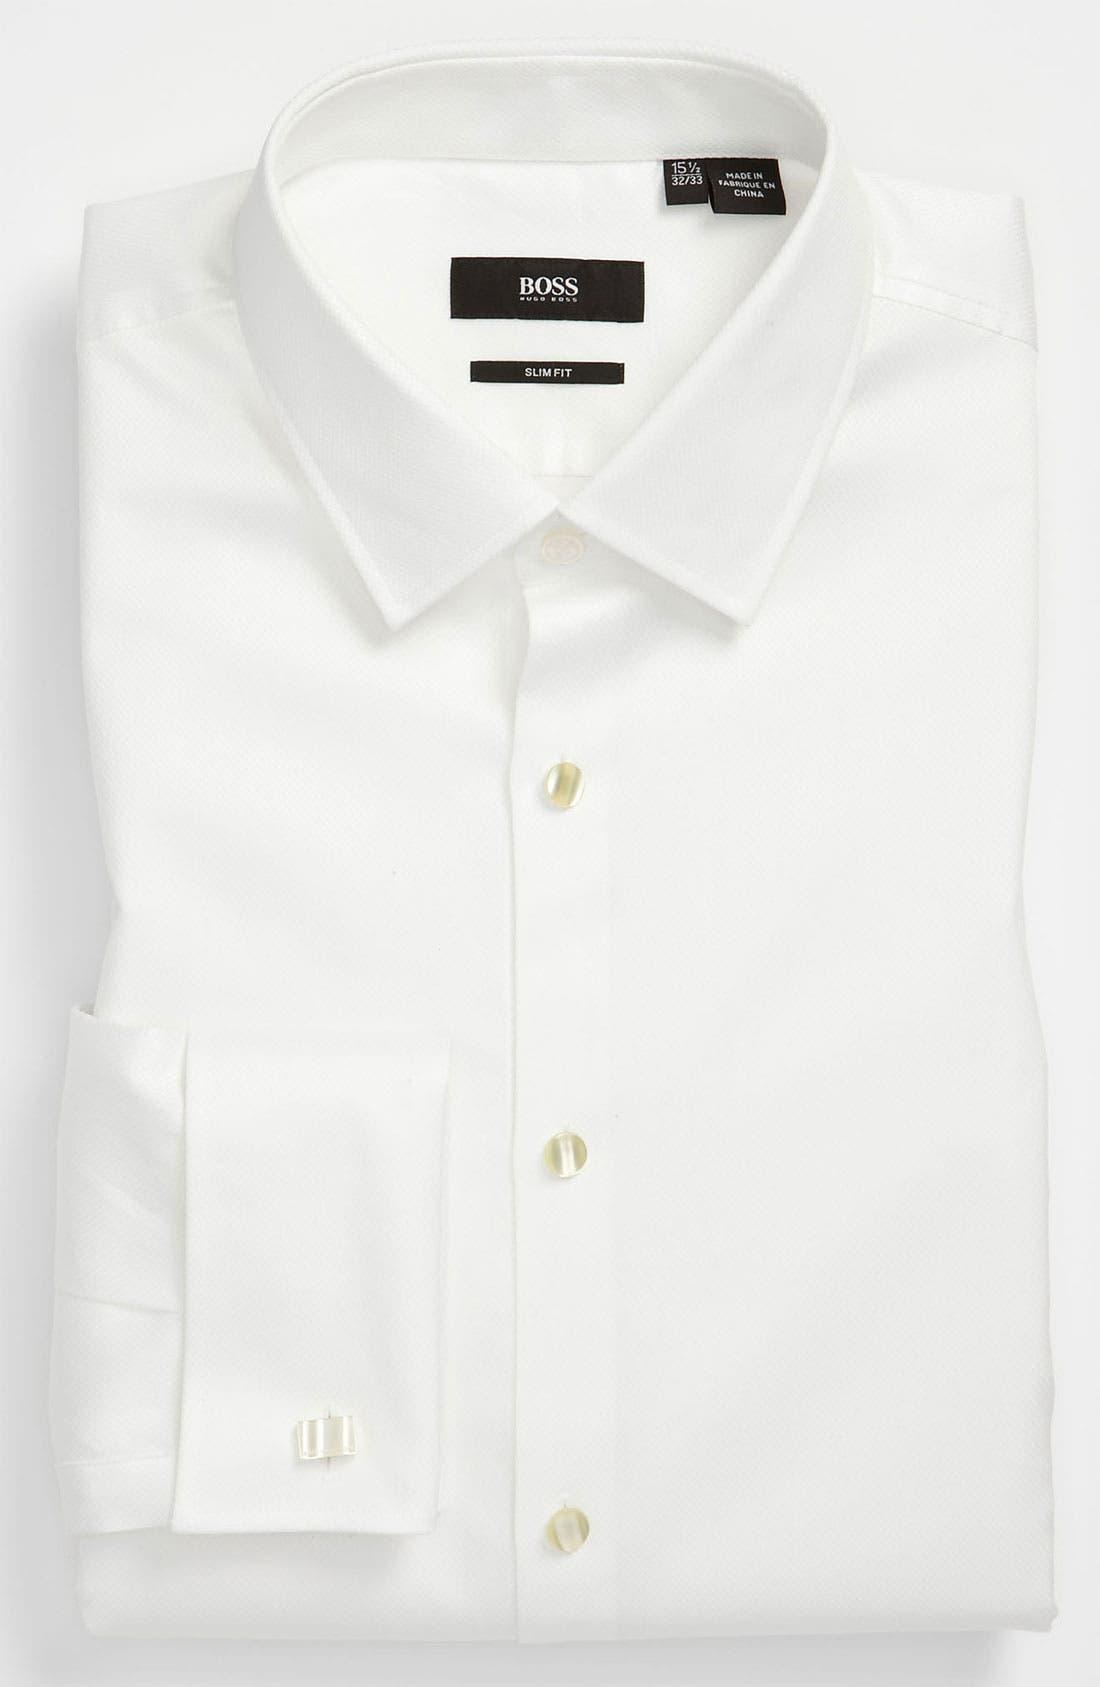 BOSS Jameson Slim Fit Diamond Weave French Cuff Tuxedo Shirt